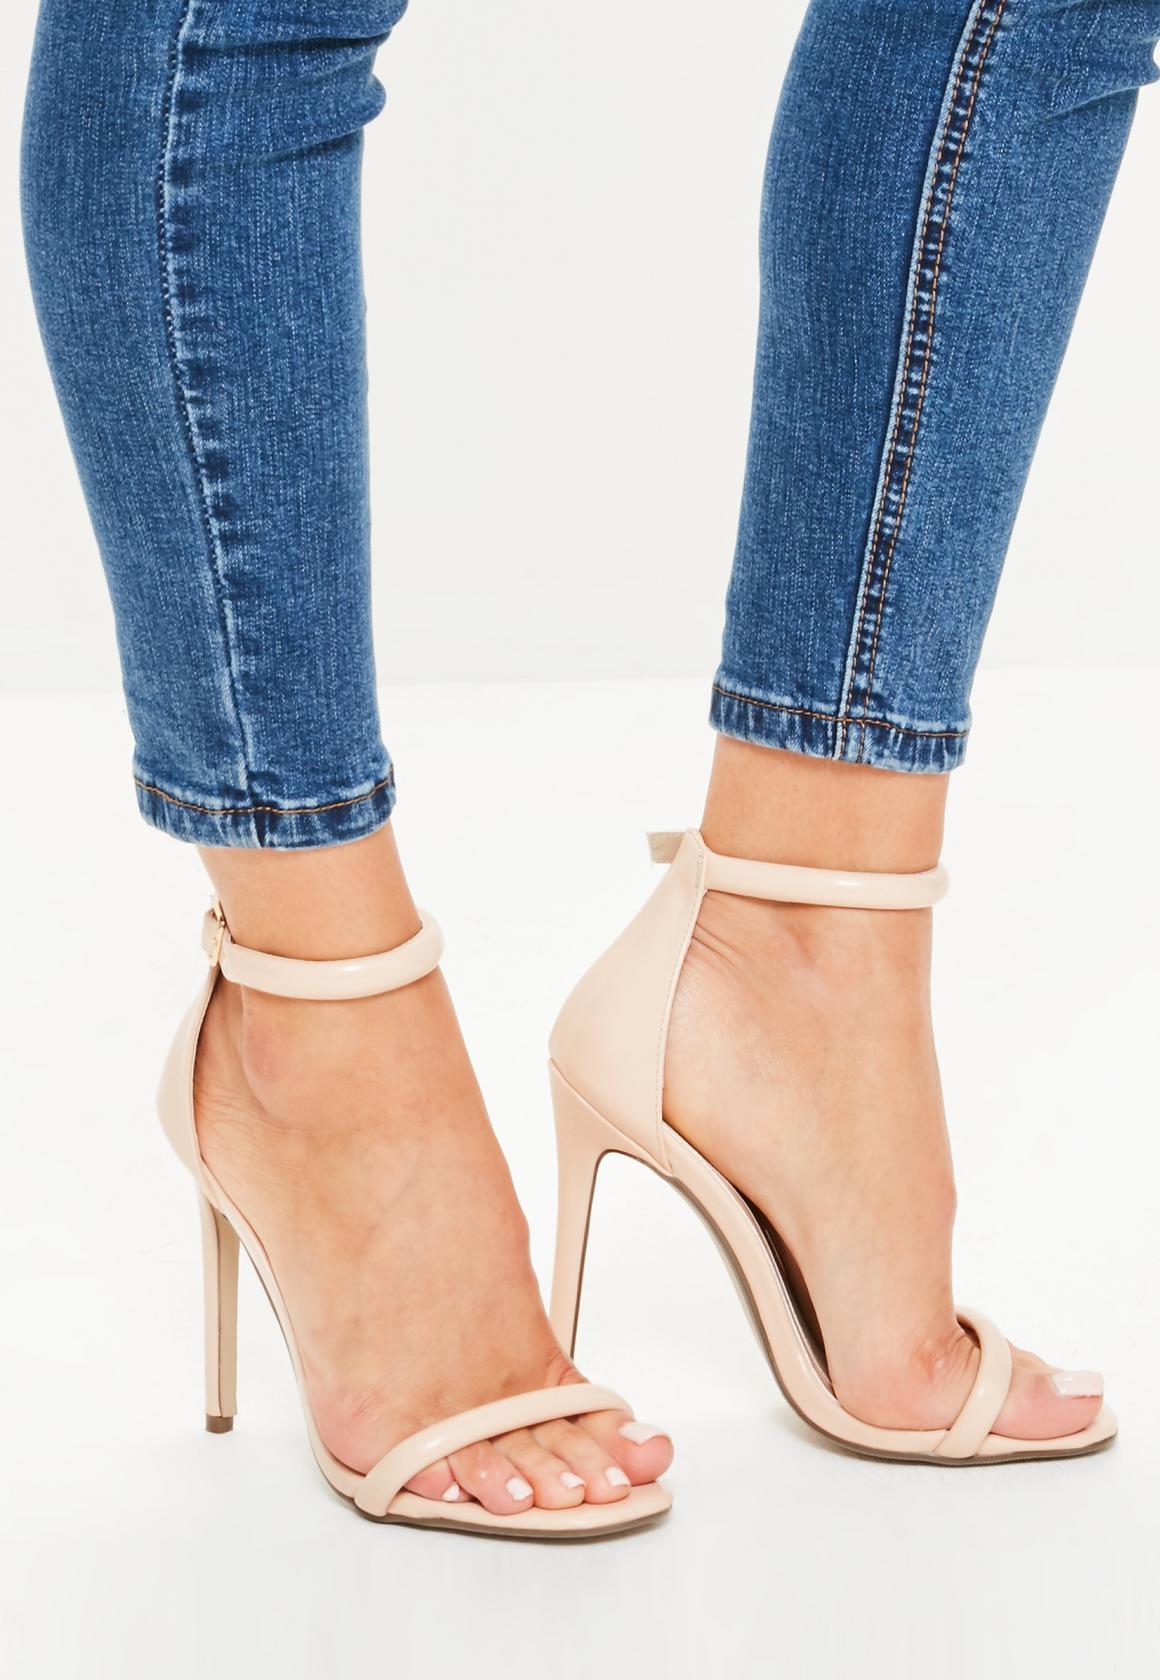 nude high heels previous next boarcal